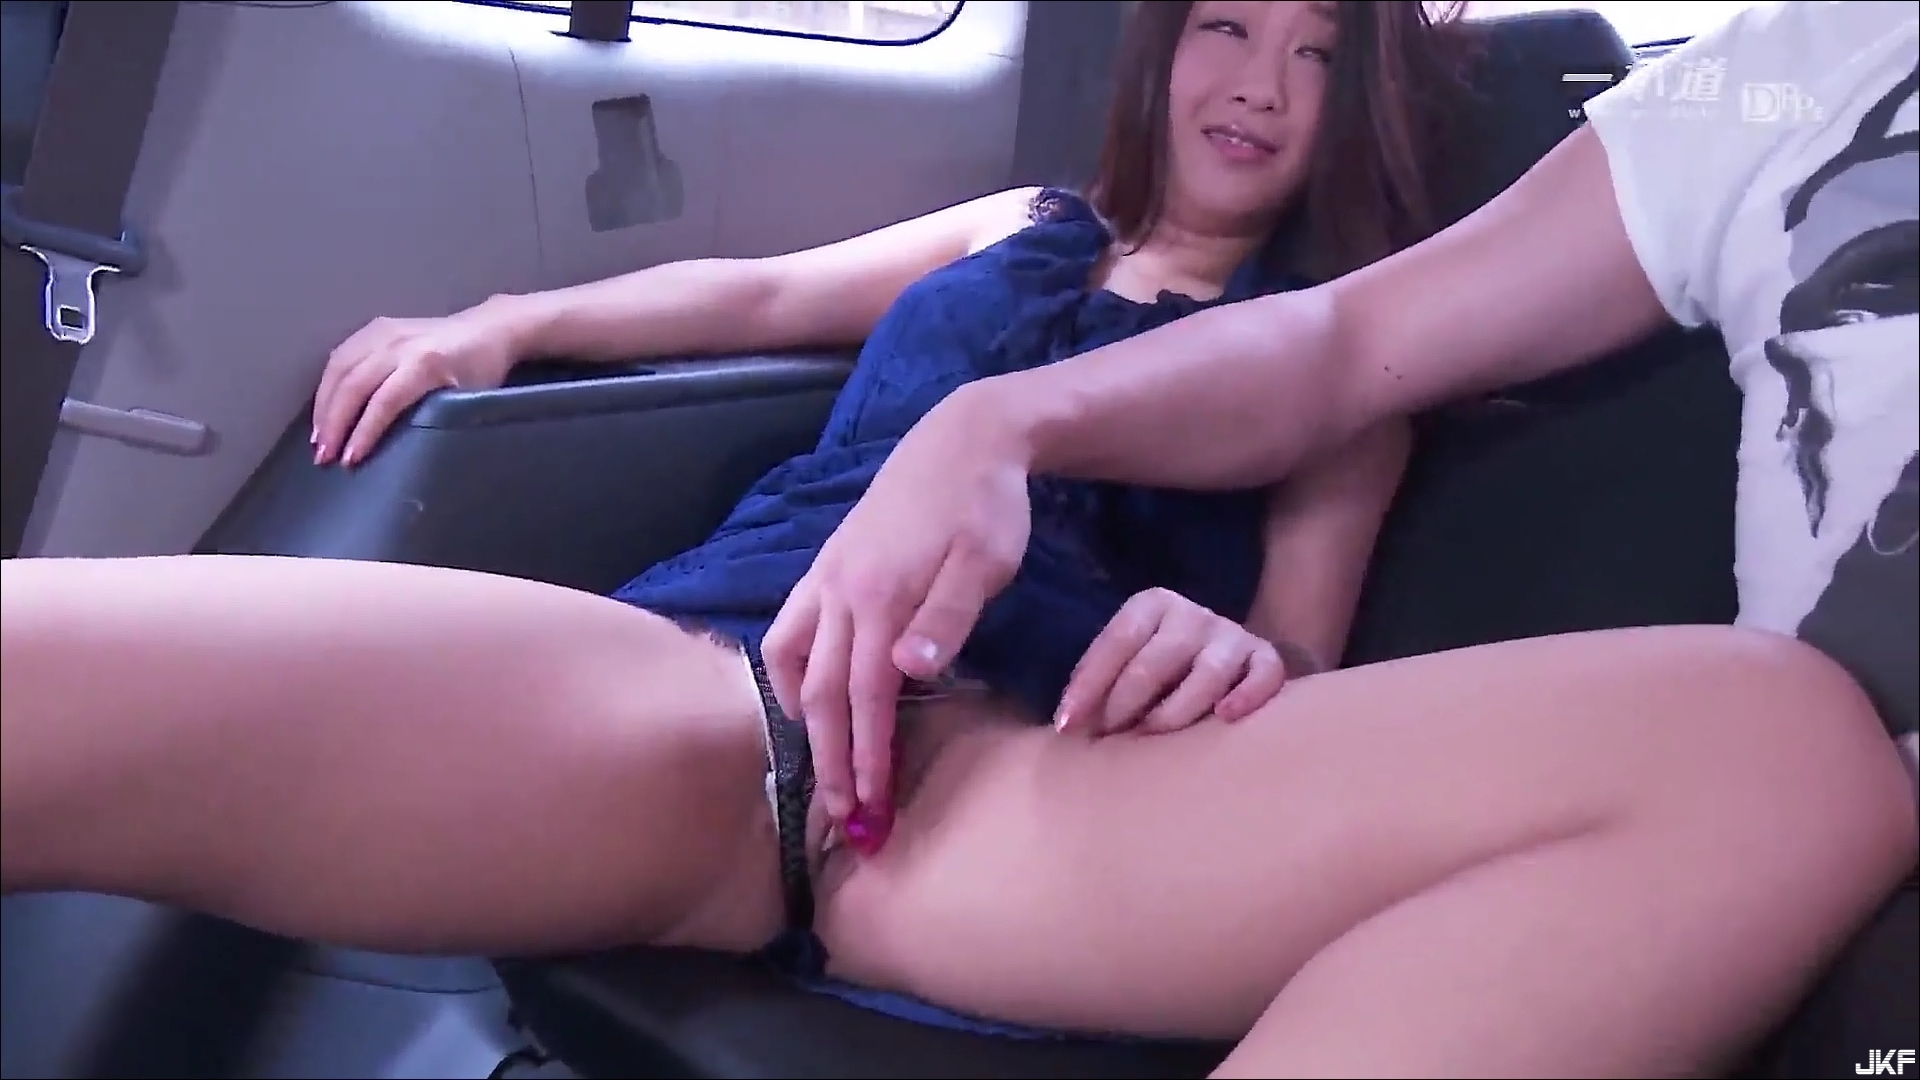 Satomi Suzuki-020.jpg